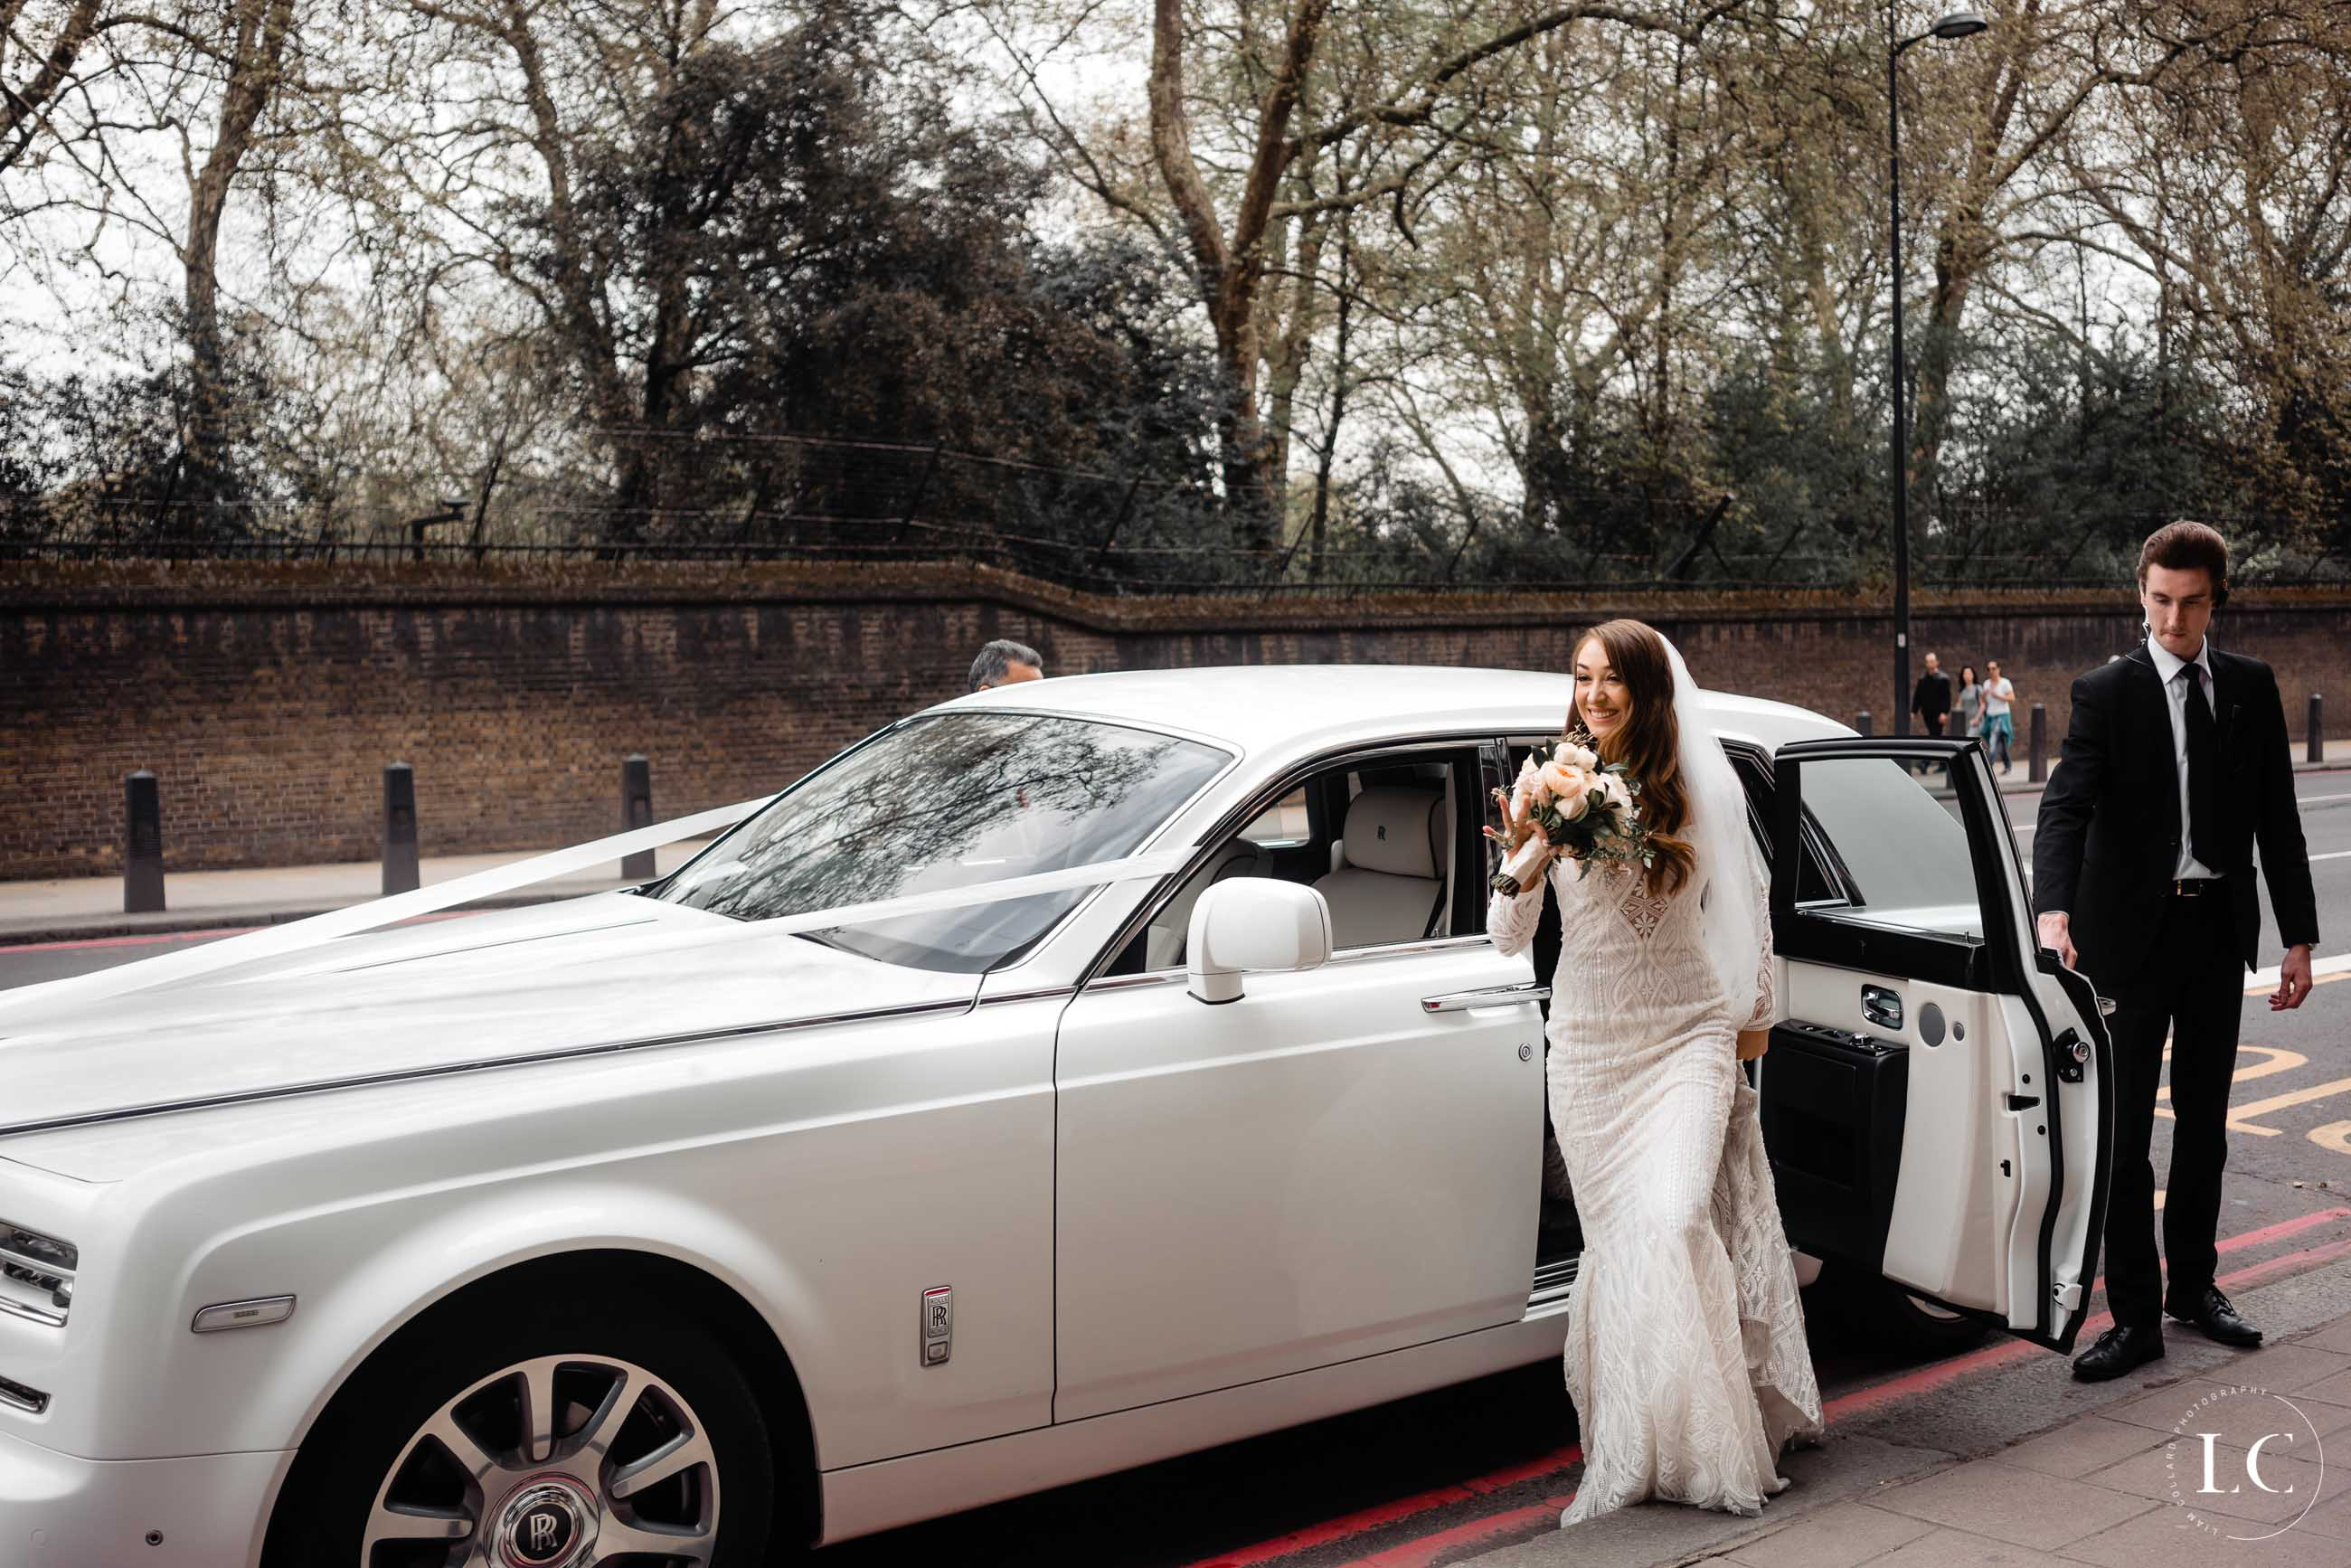 Bride next to car